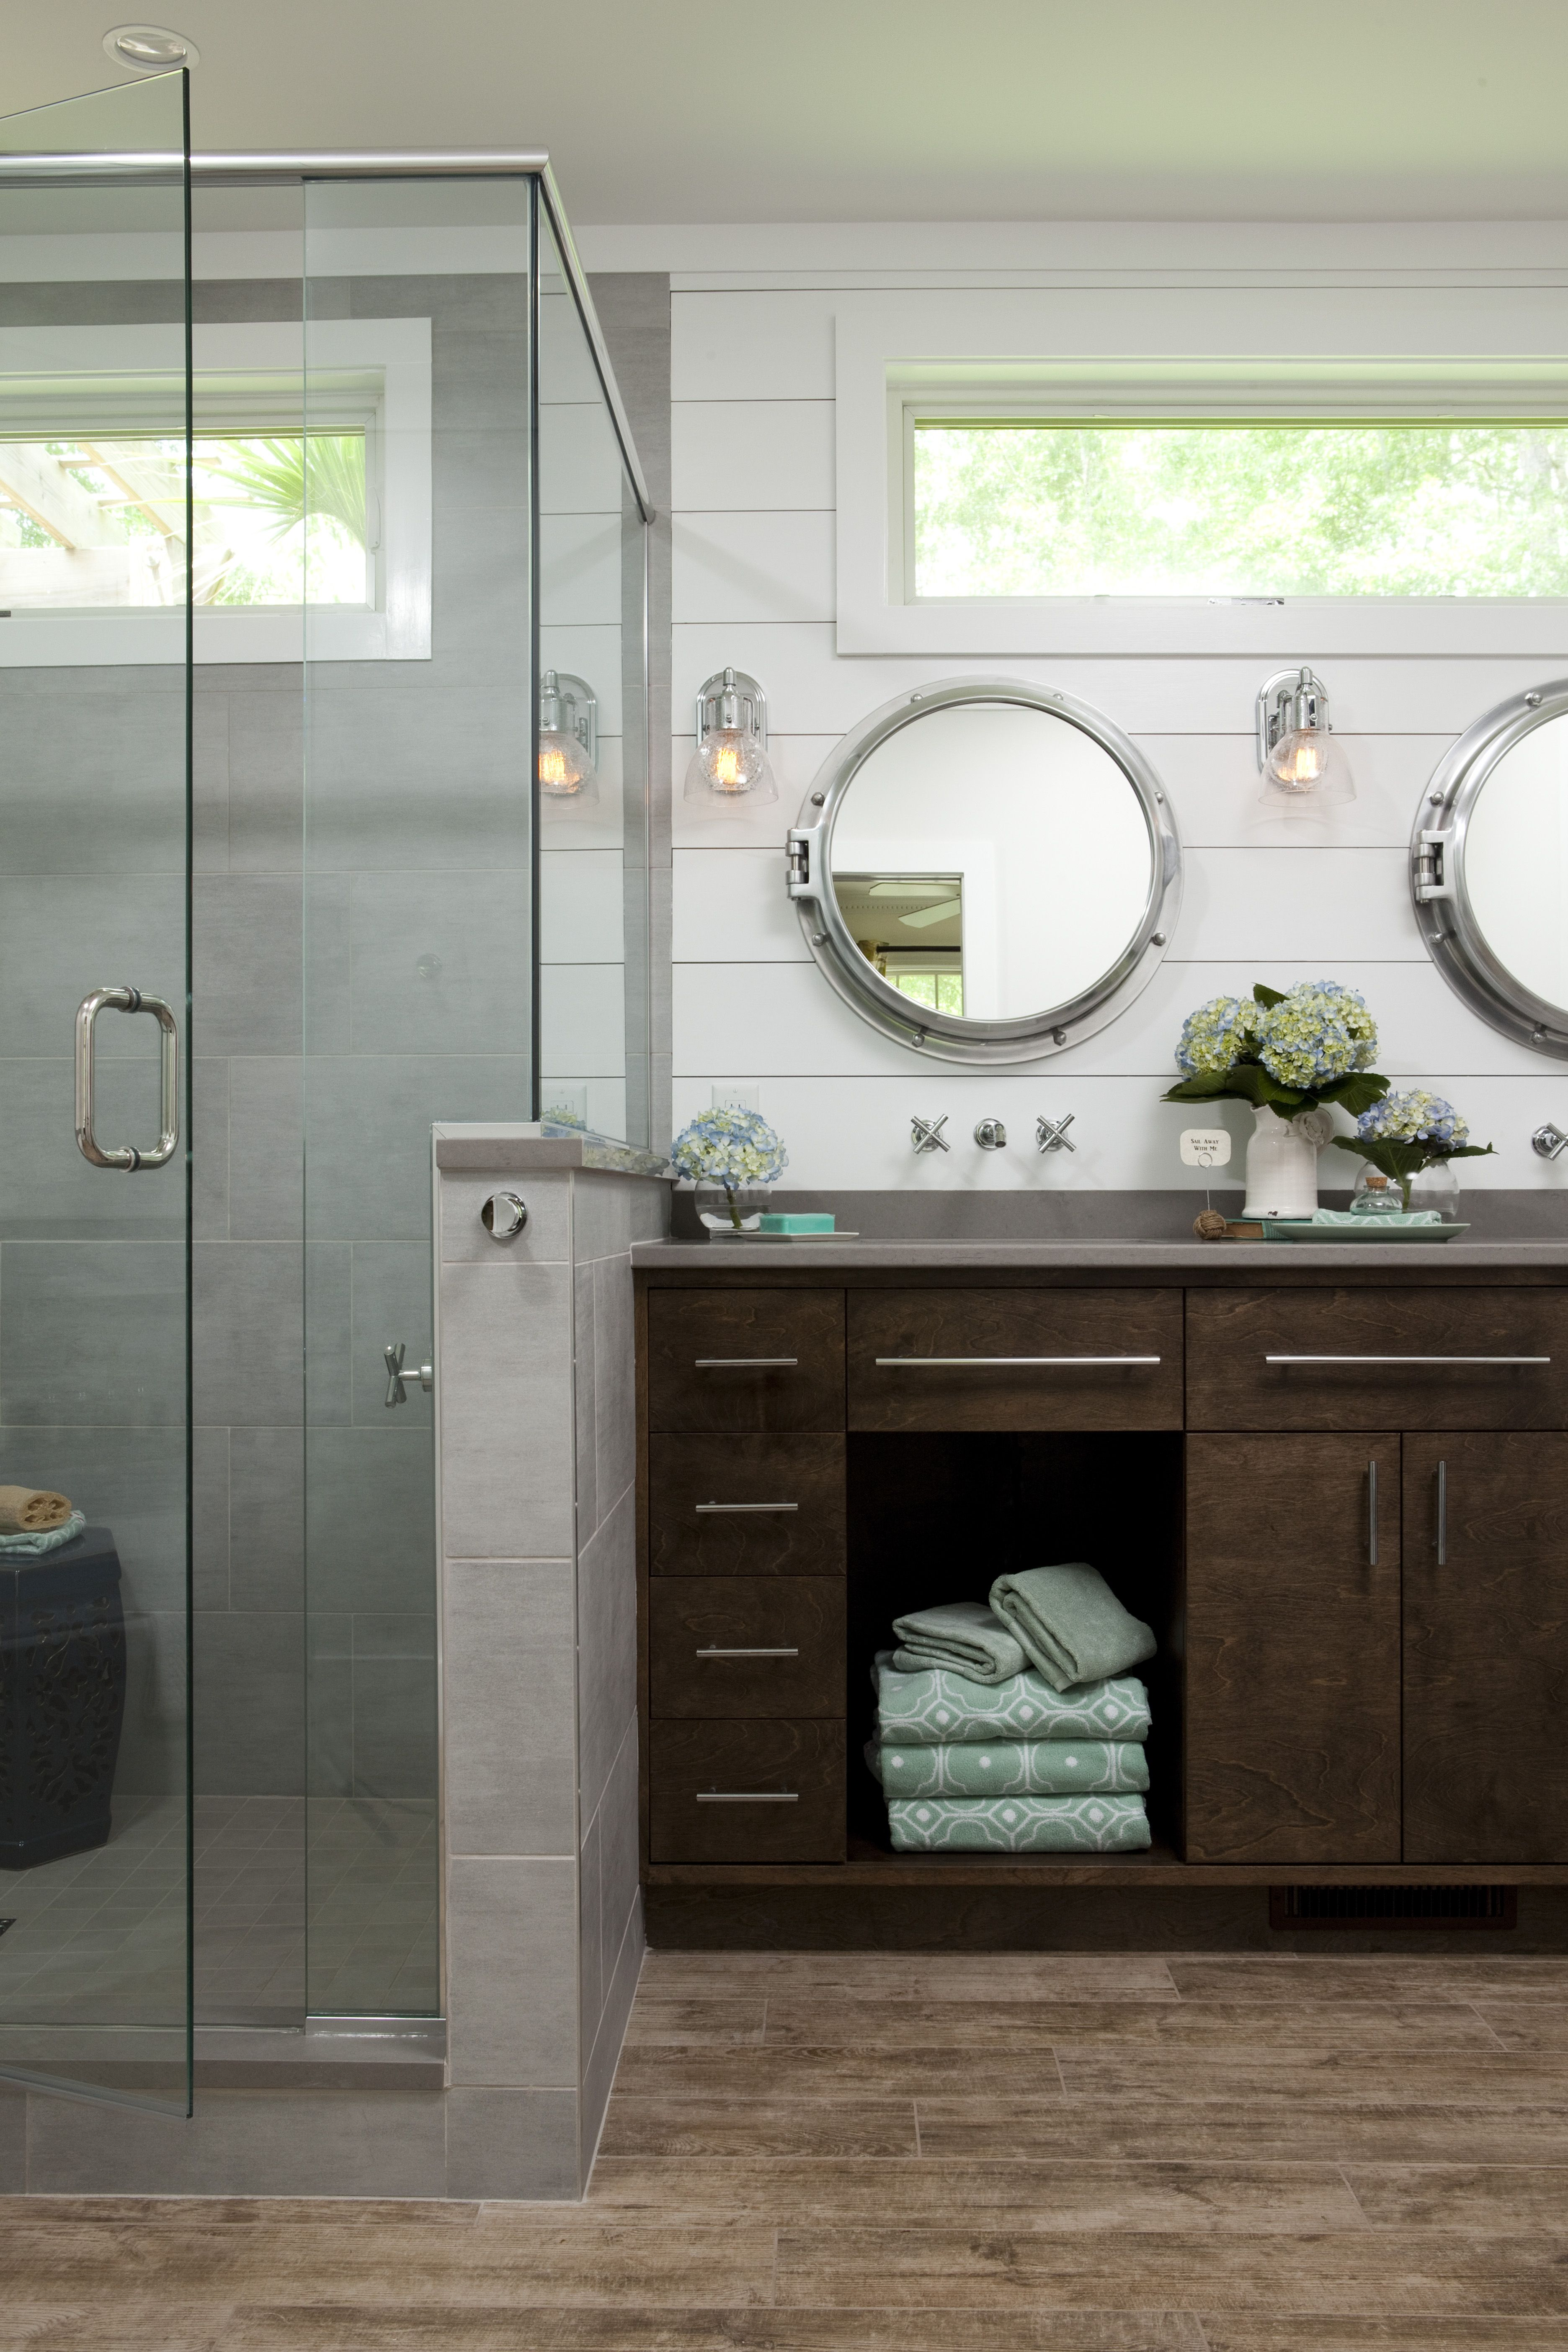 Prioritiesumaximize the functionality of the homeus only bathroom